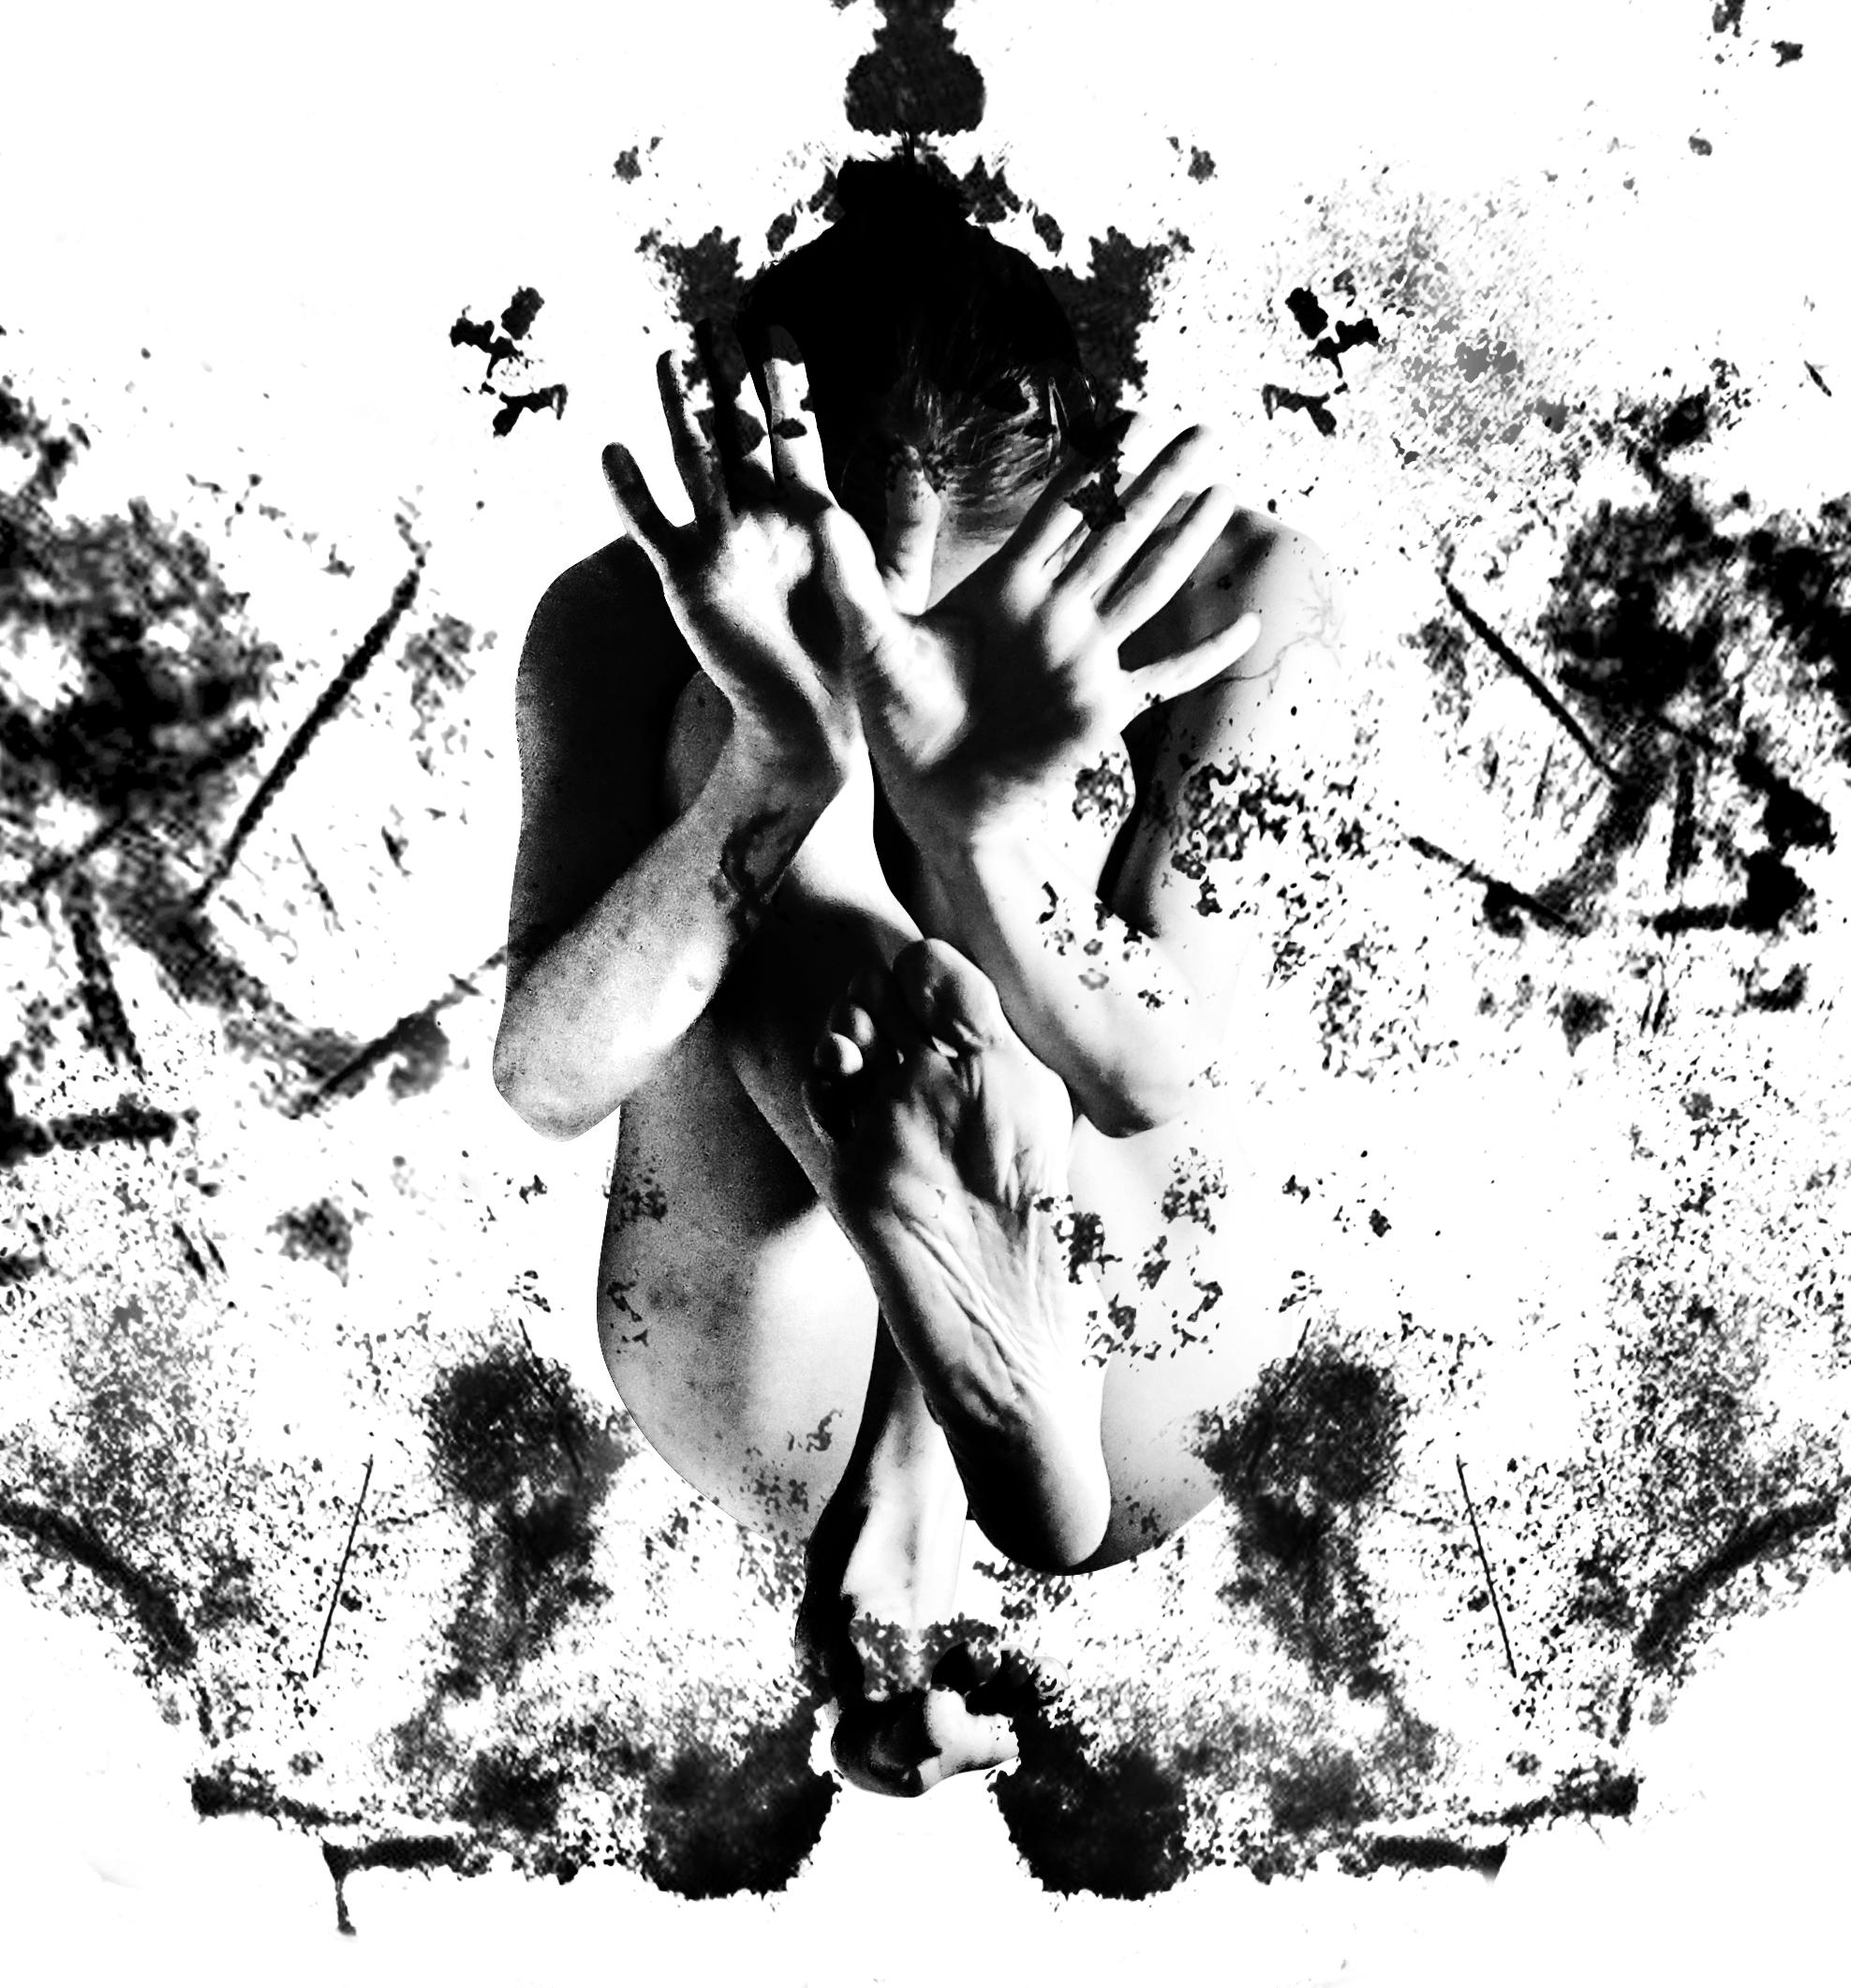 Trennen / Dissociating suelynee ho 何書伶 Artwork photographer nude art